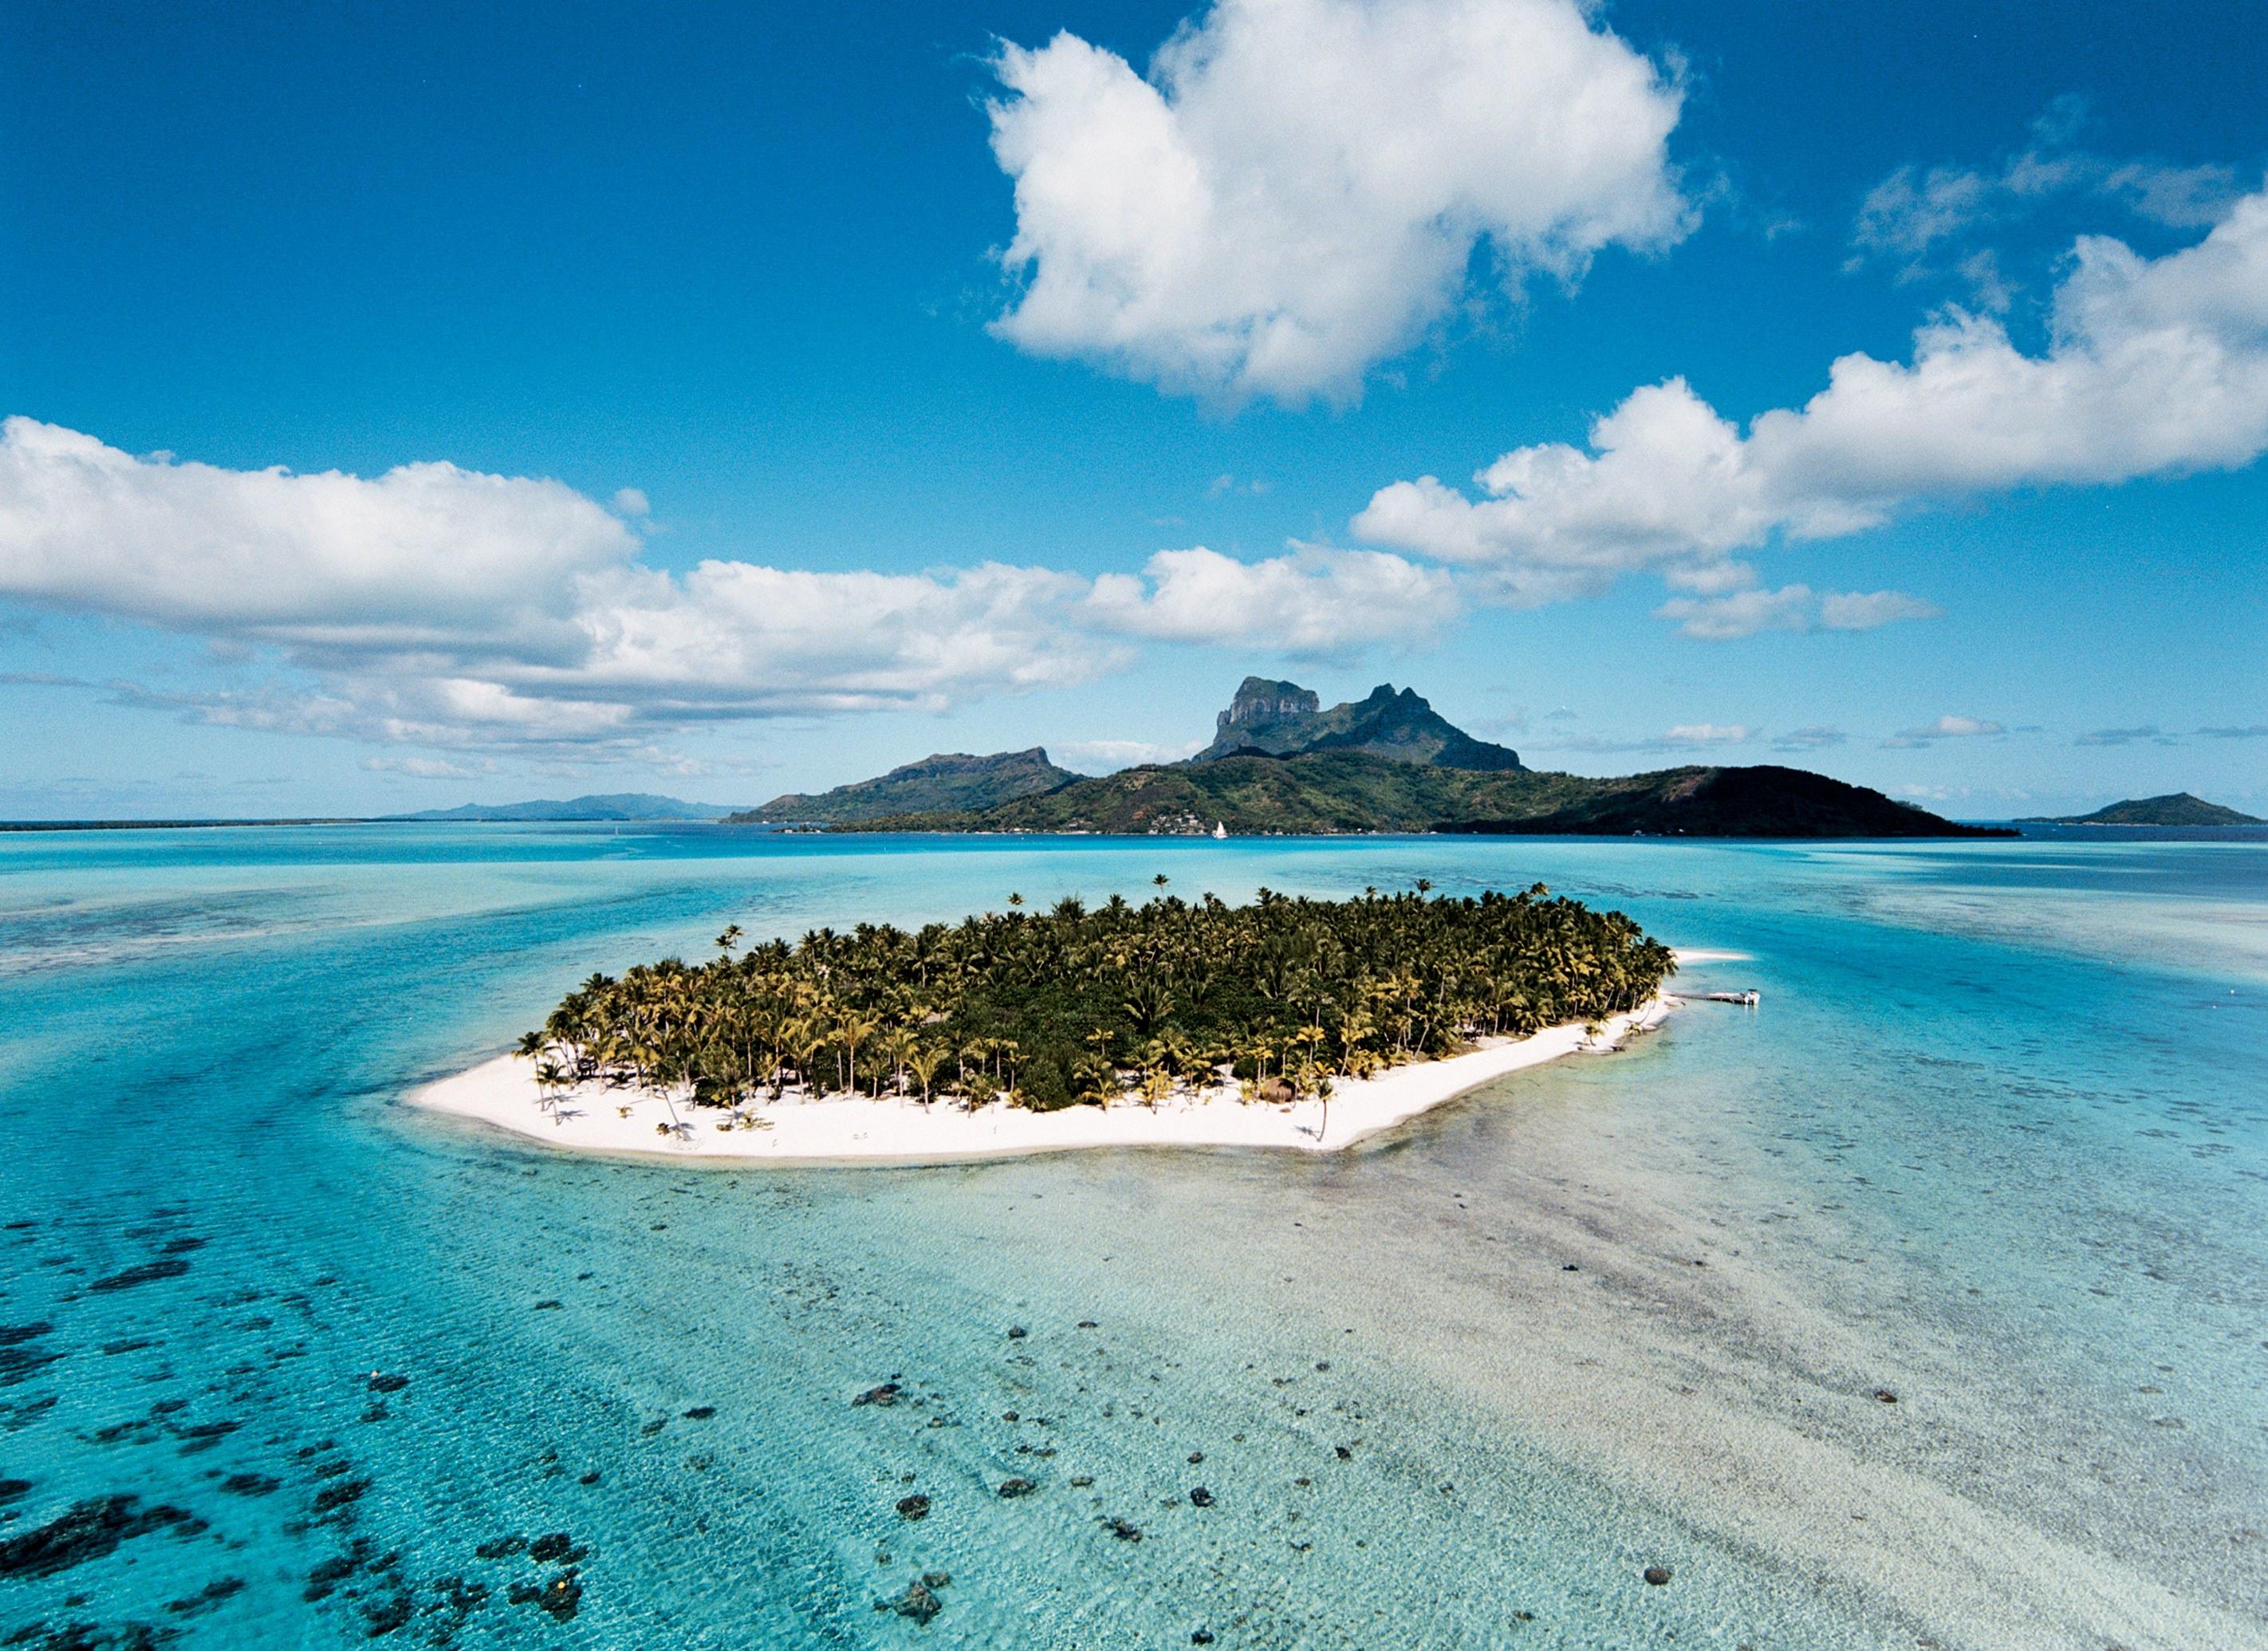 1-francois-nars-coloca-ilha-paradisiaca-na-costa-de-bora-bora-a-venda